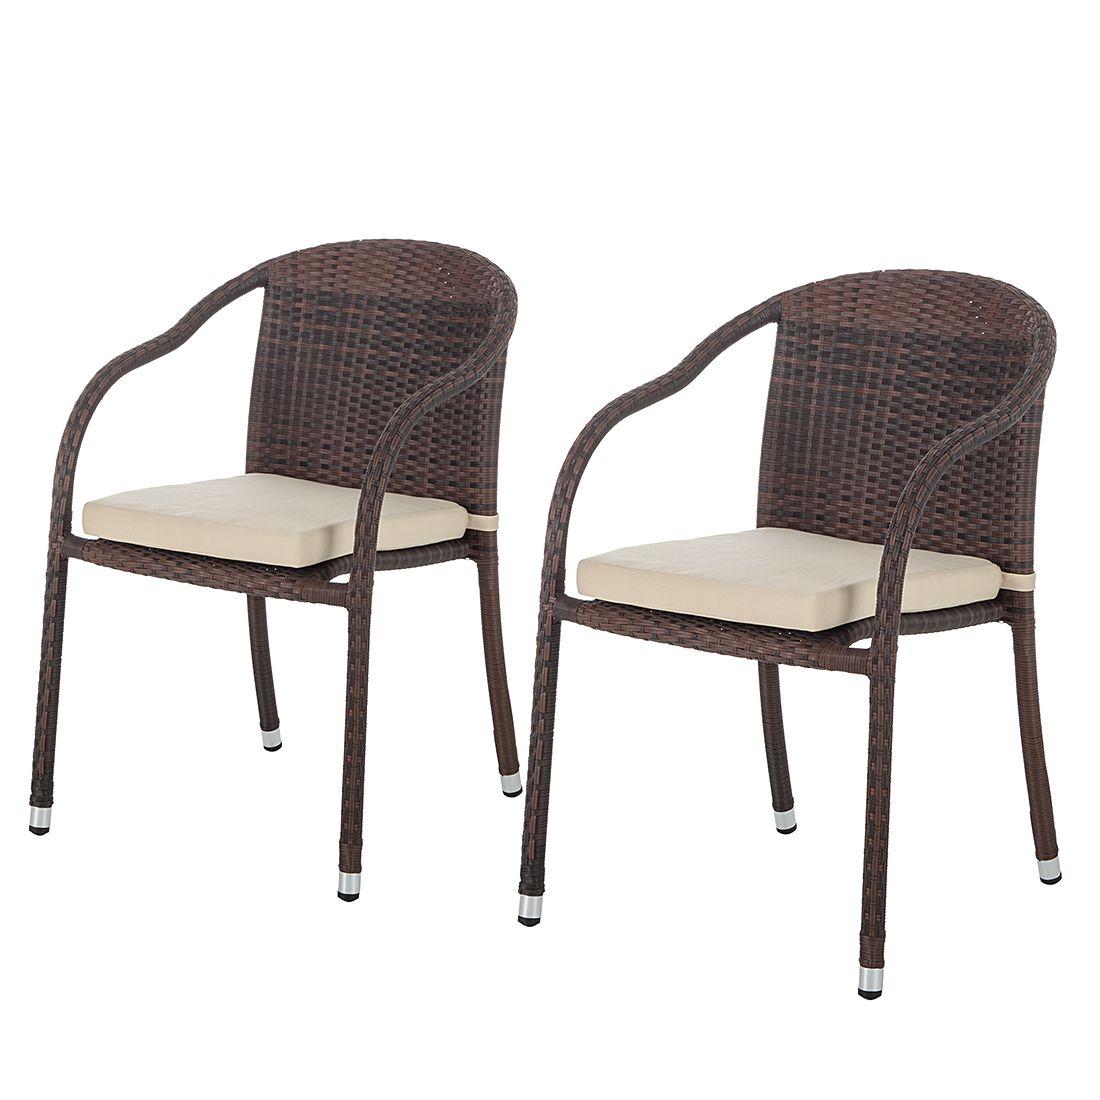 21 sparen stapelstuhl paradise lounge 2er set von fredriks nur 149 99 cherry m bel. Black Bedroom Furniture Sets. Home Design Ideas